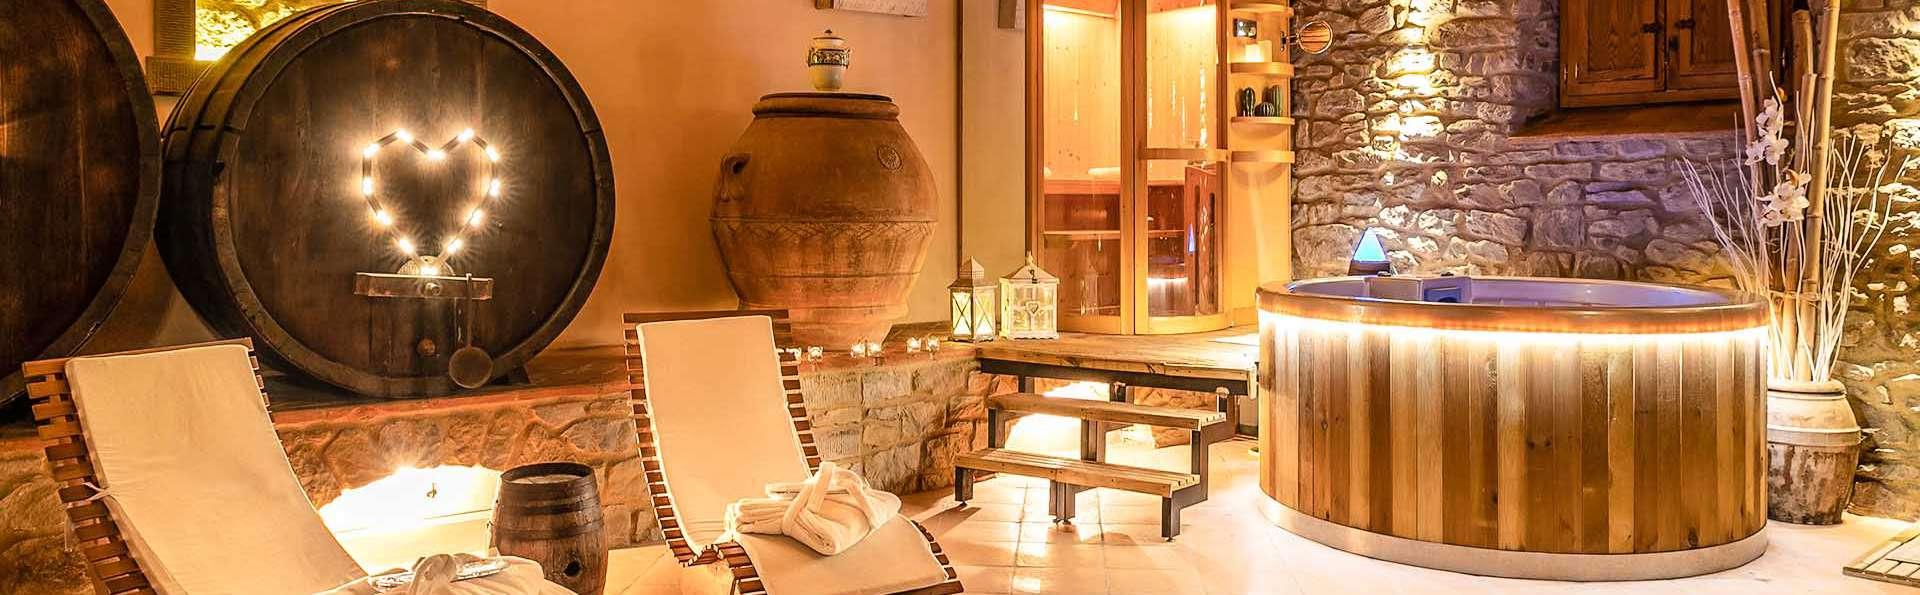 Borgo Dolci Colline Spa & Relax - EDIT_Borgo_Dolci_Colline_04.jpg